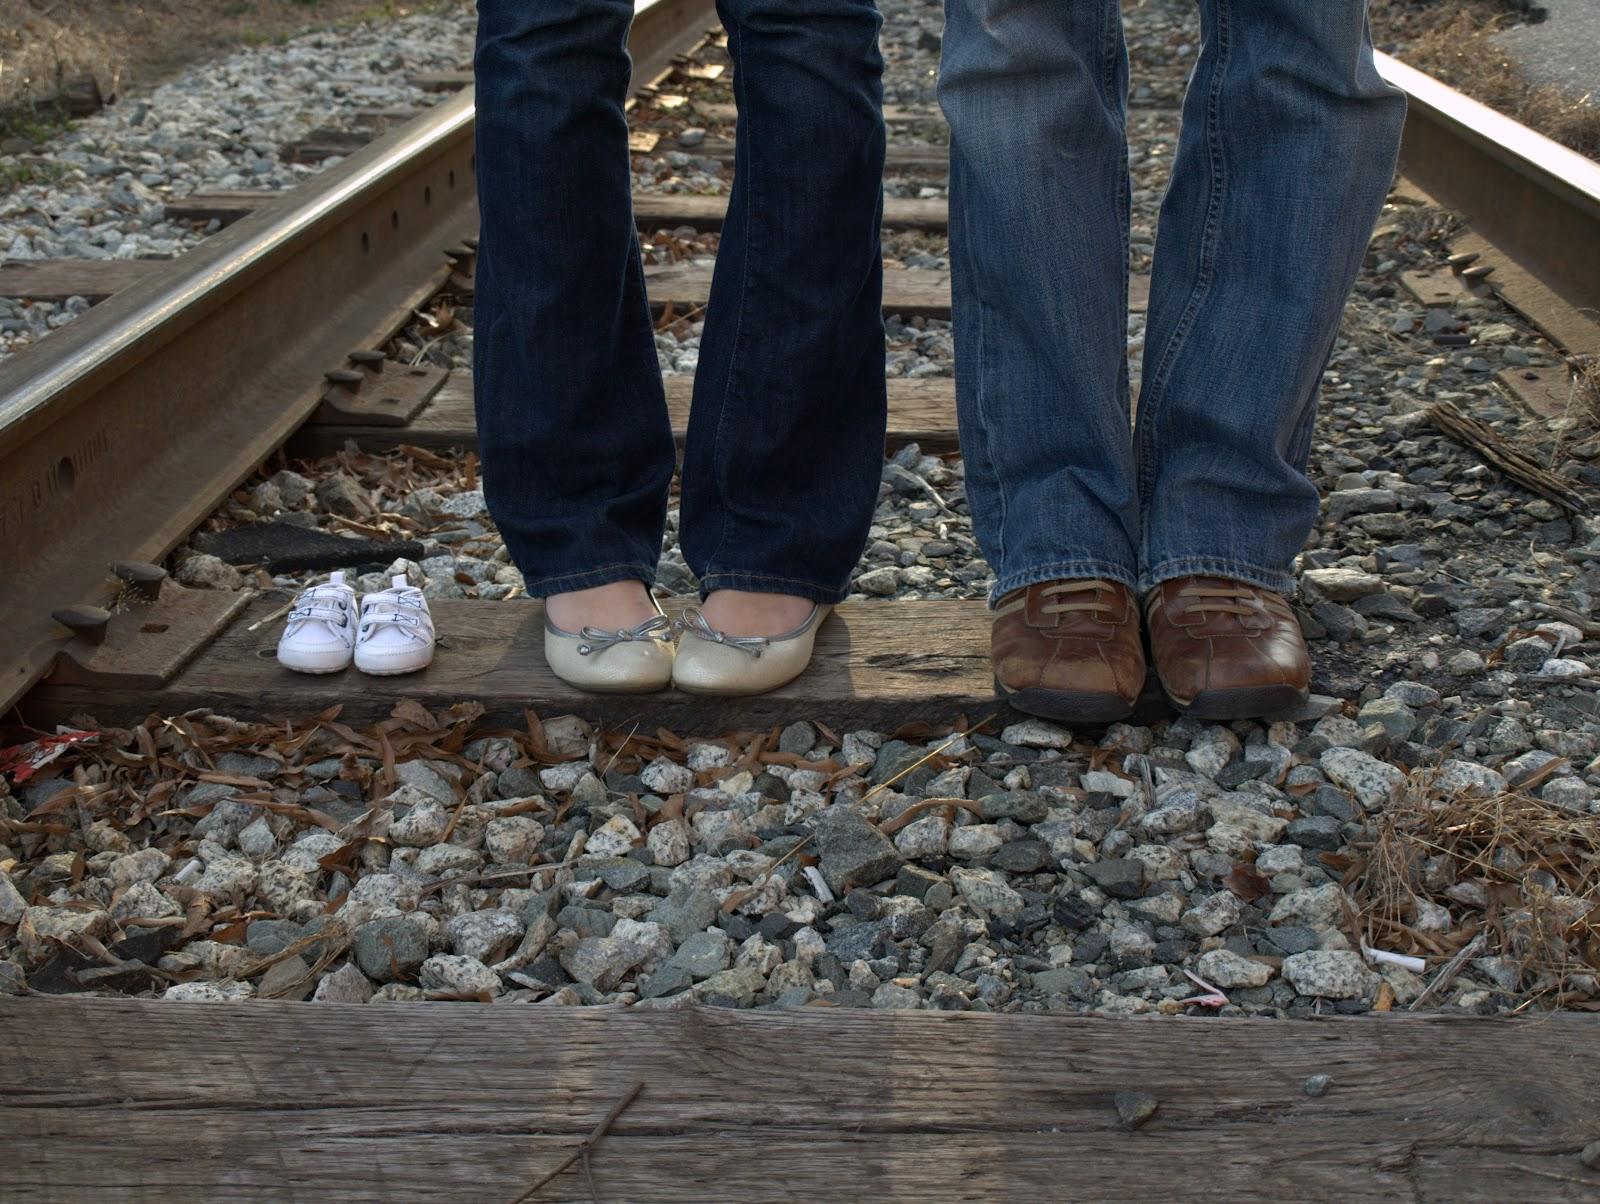 Ben + Susannah & Baby!: Pregnancy Announcement Photos UPDATED!